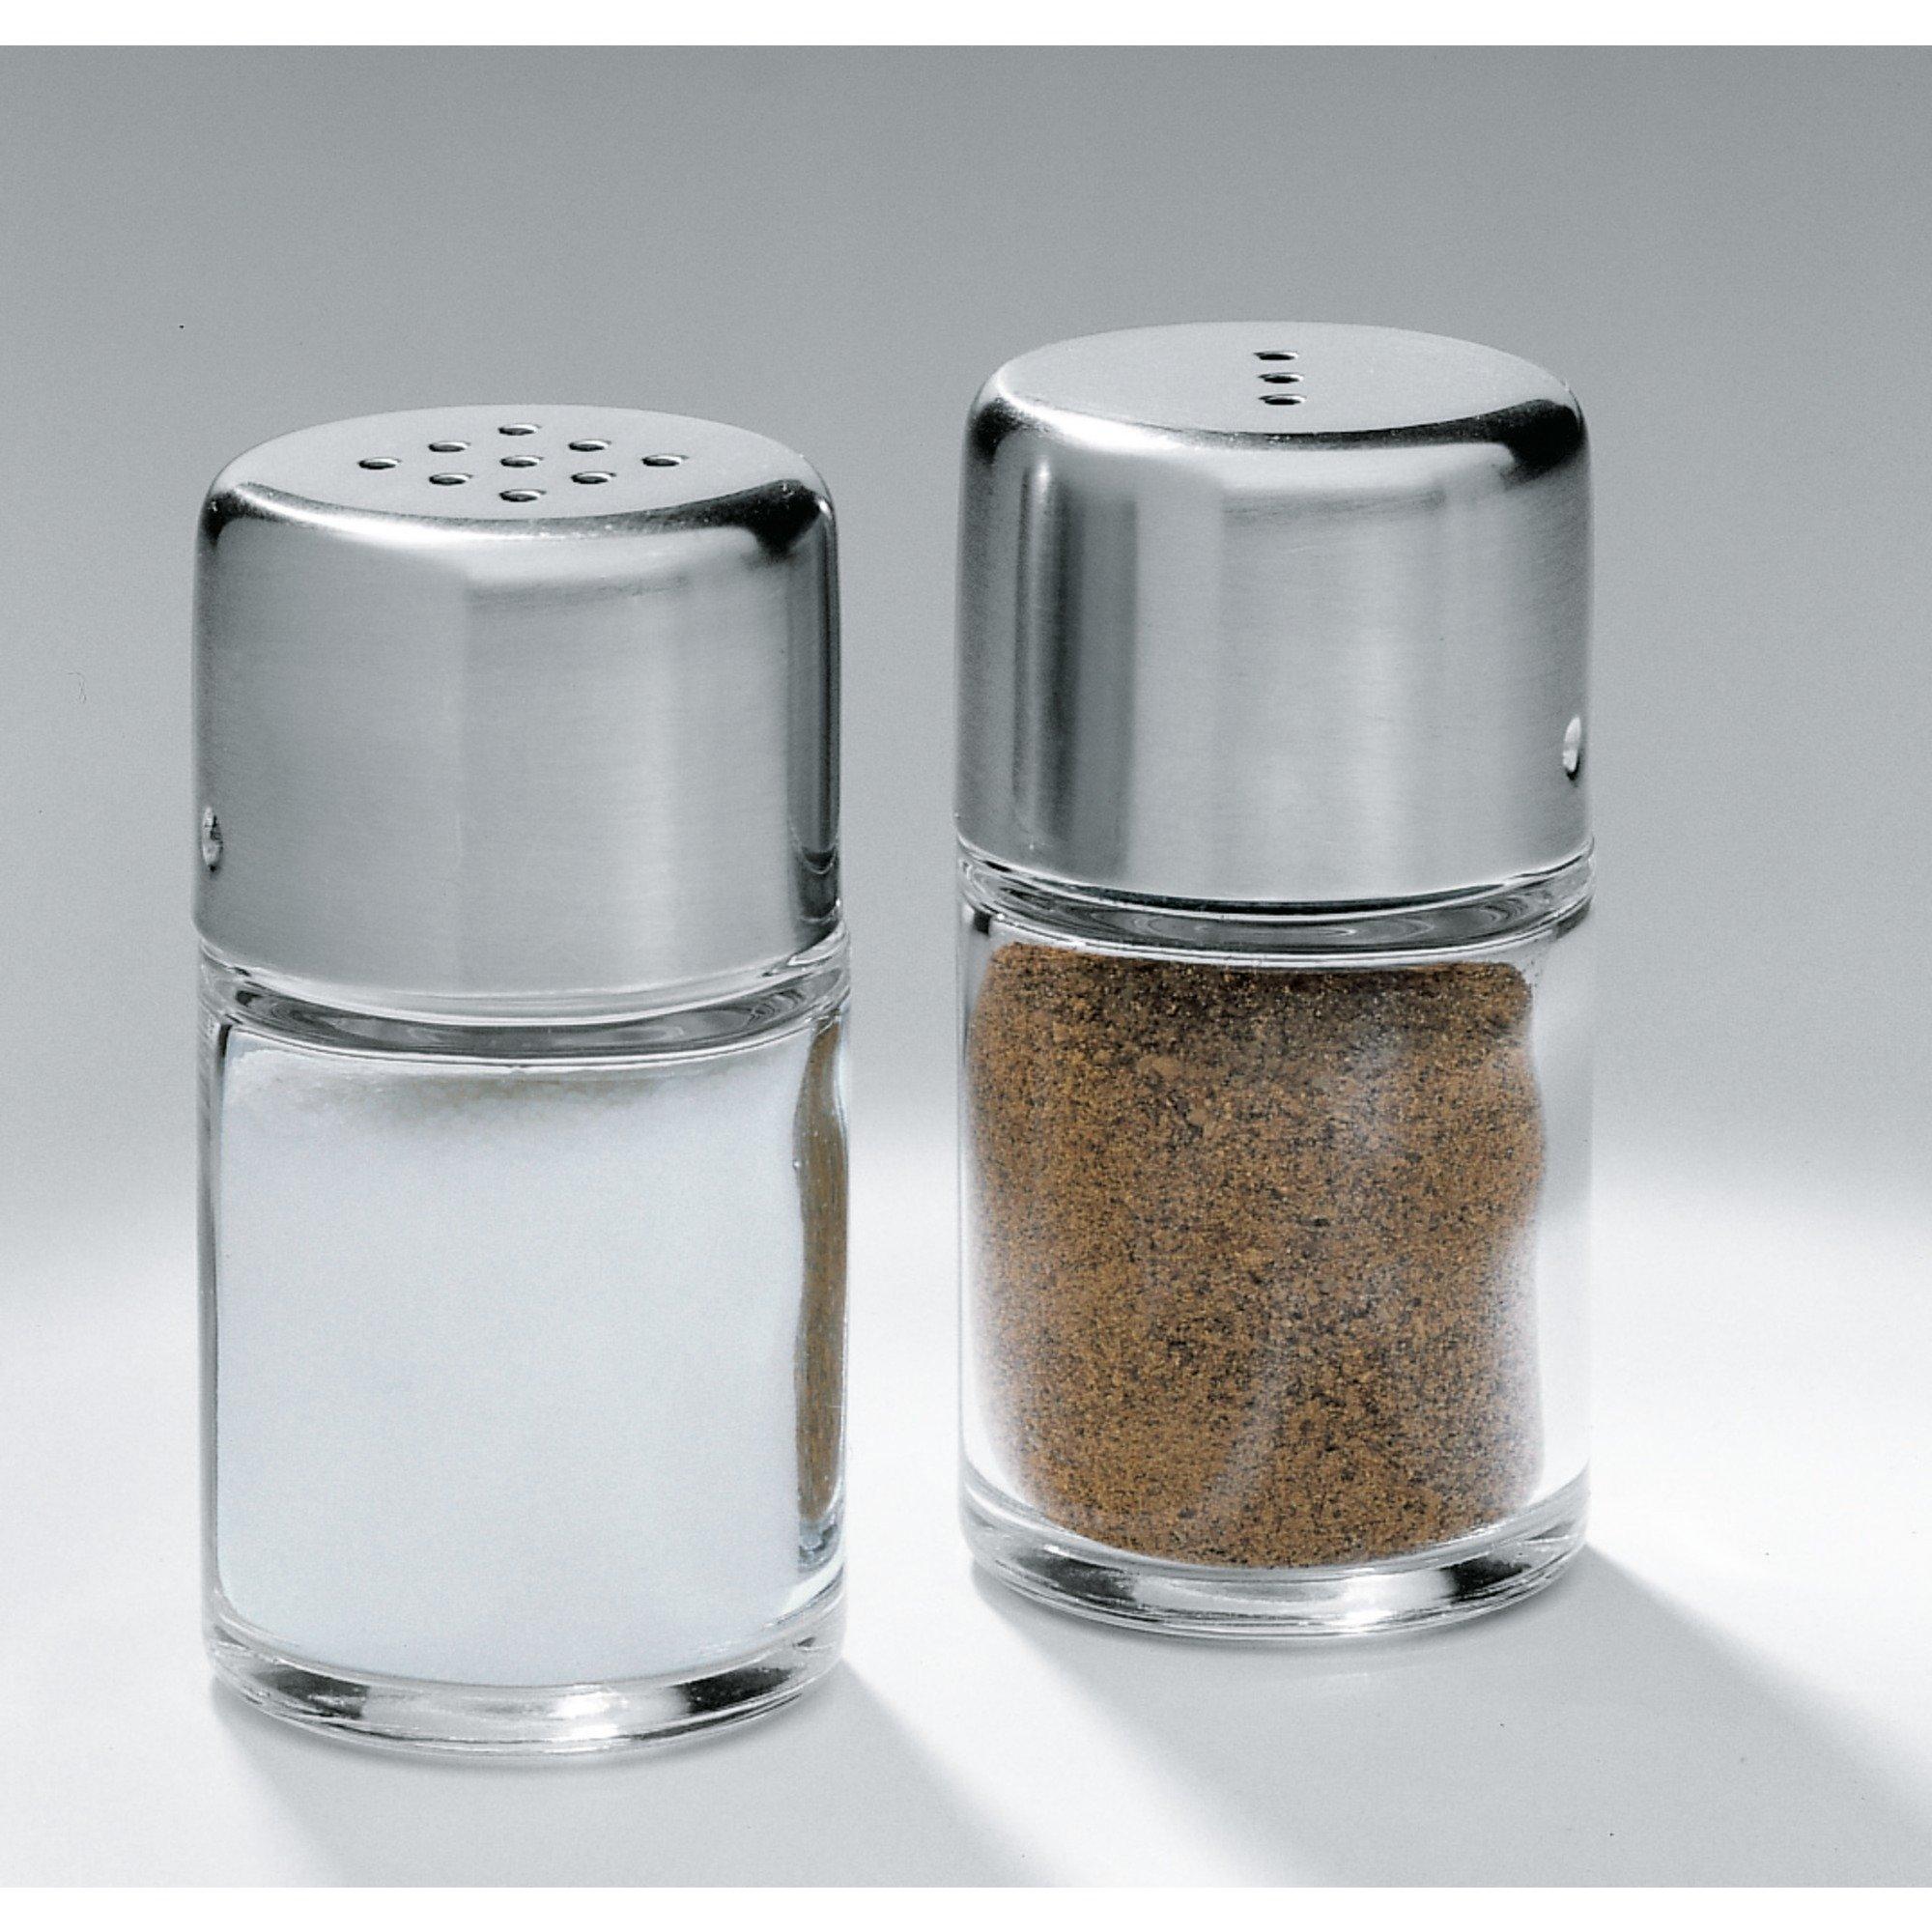 Salz-/ Pfefferstreuer-Set 2-teilig Bel Gusto